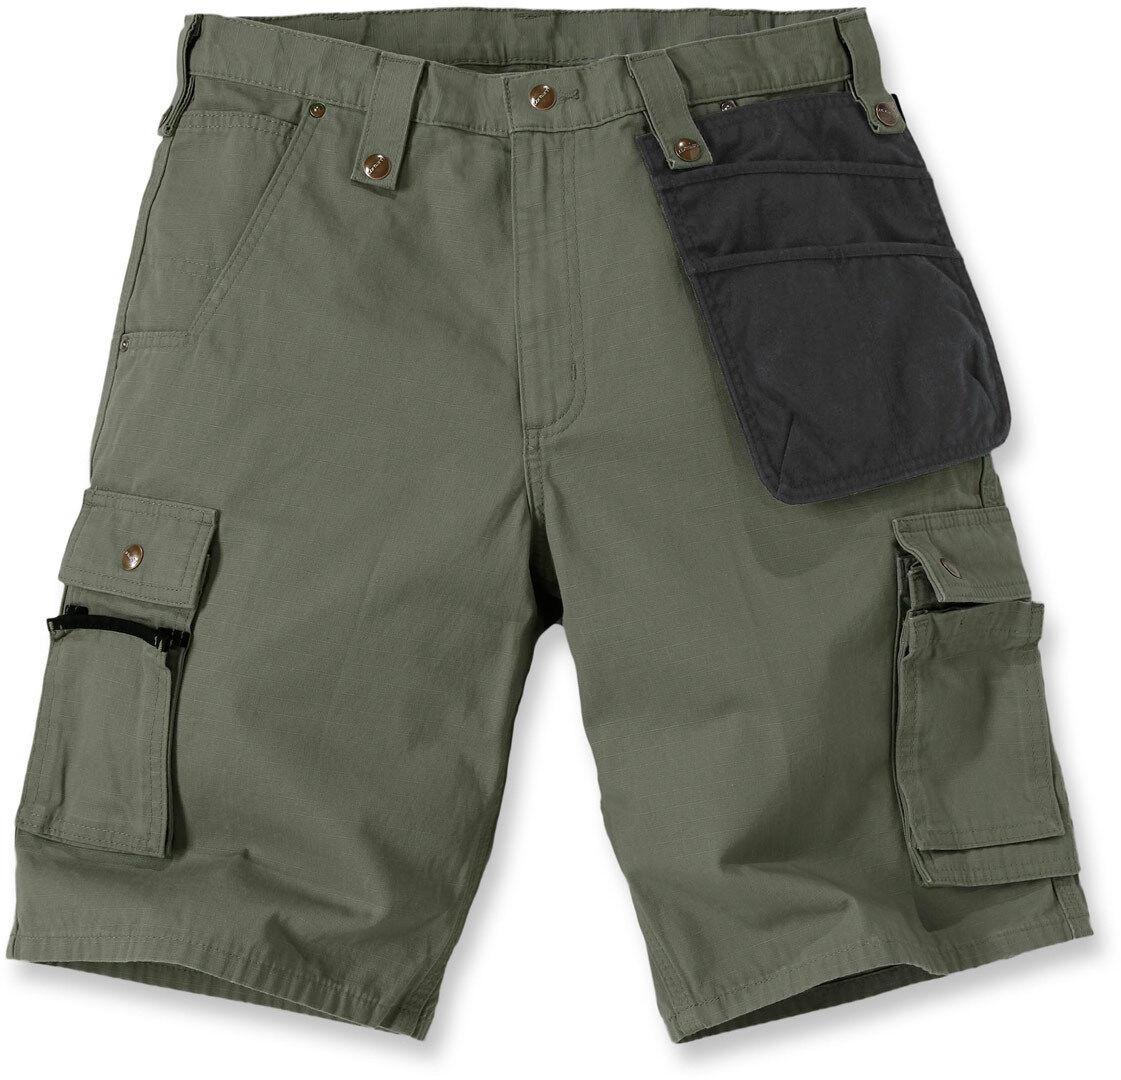 Carhartt Multi Pocket Ripstop Pantalones cortos Verde 38